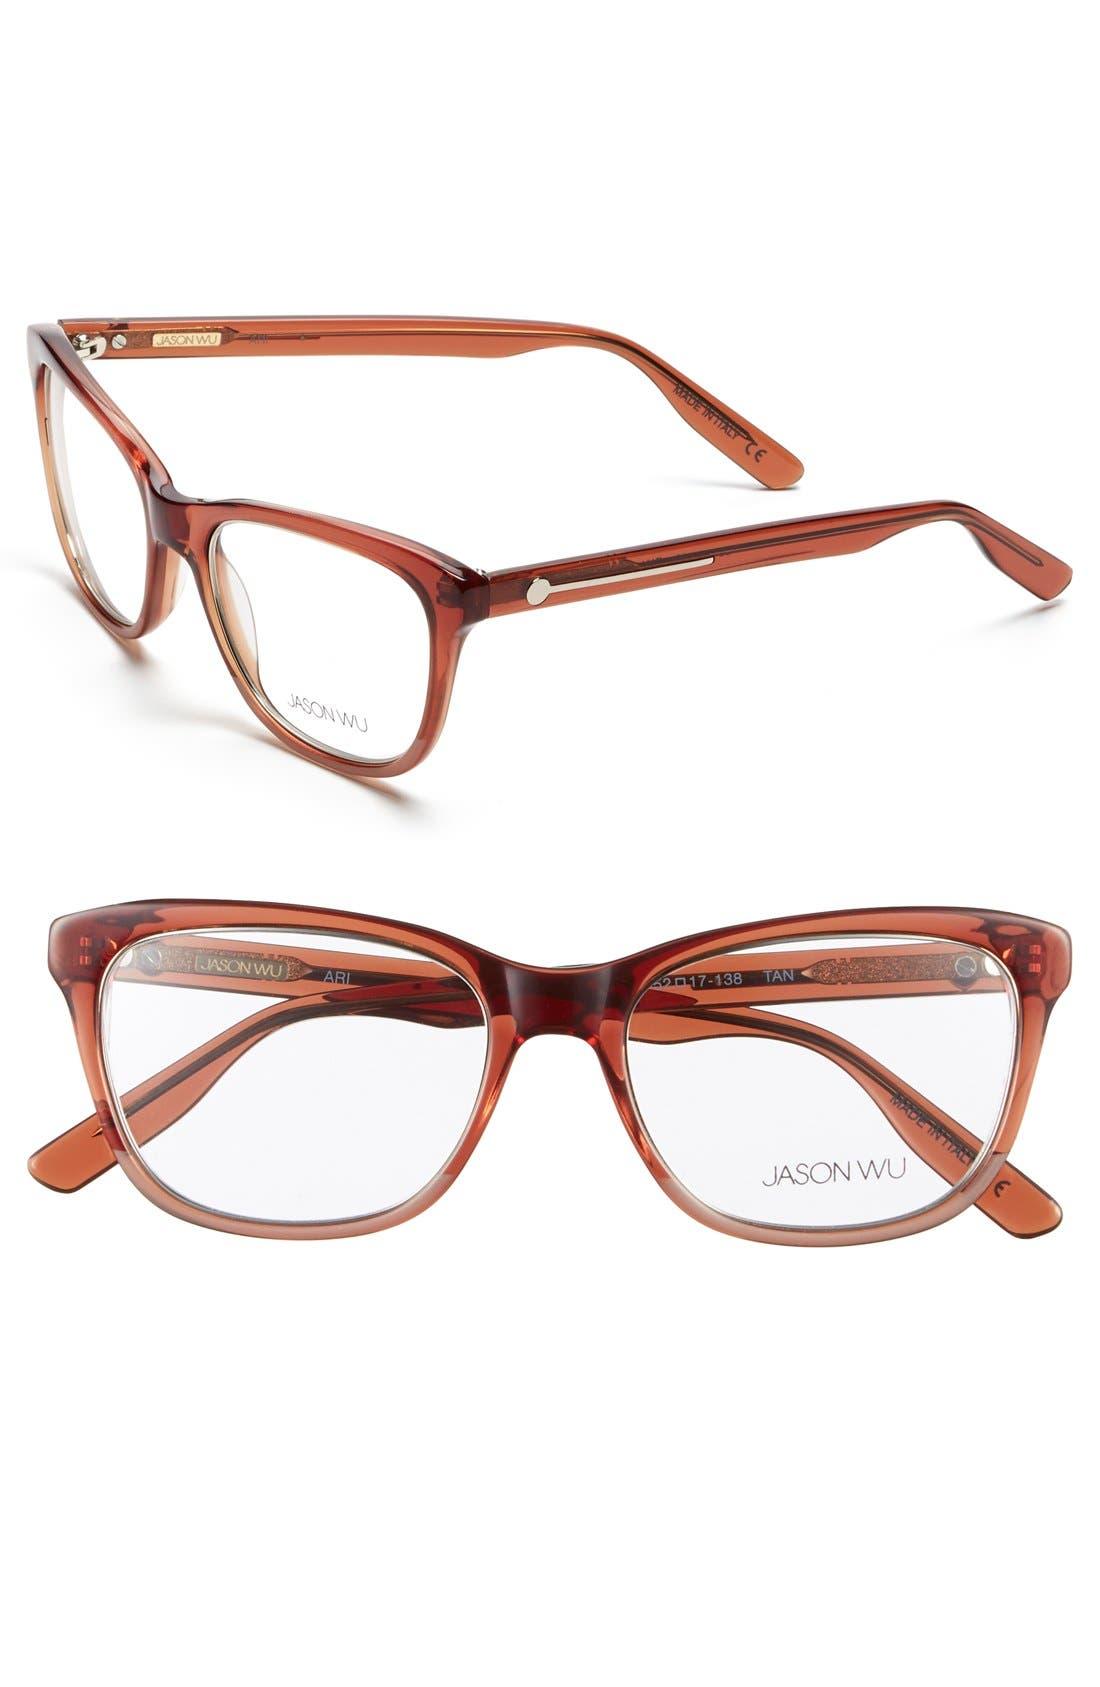 Main Image - Jason Wu 'Ari' 52mm Optical Glasses